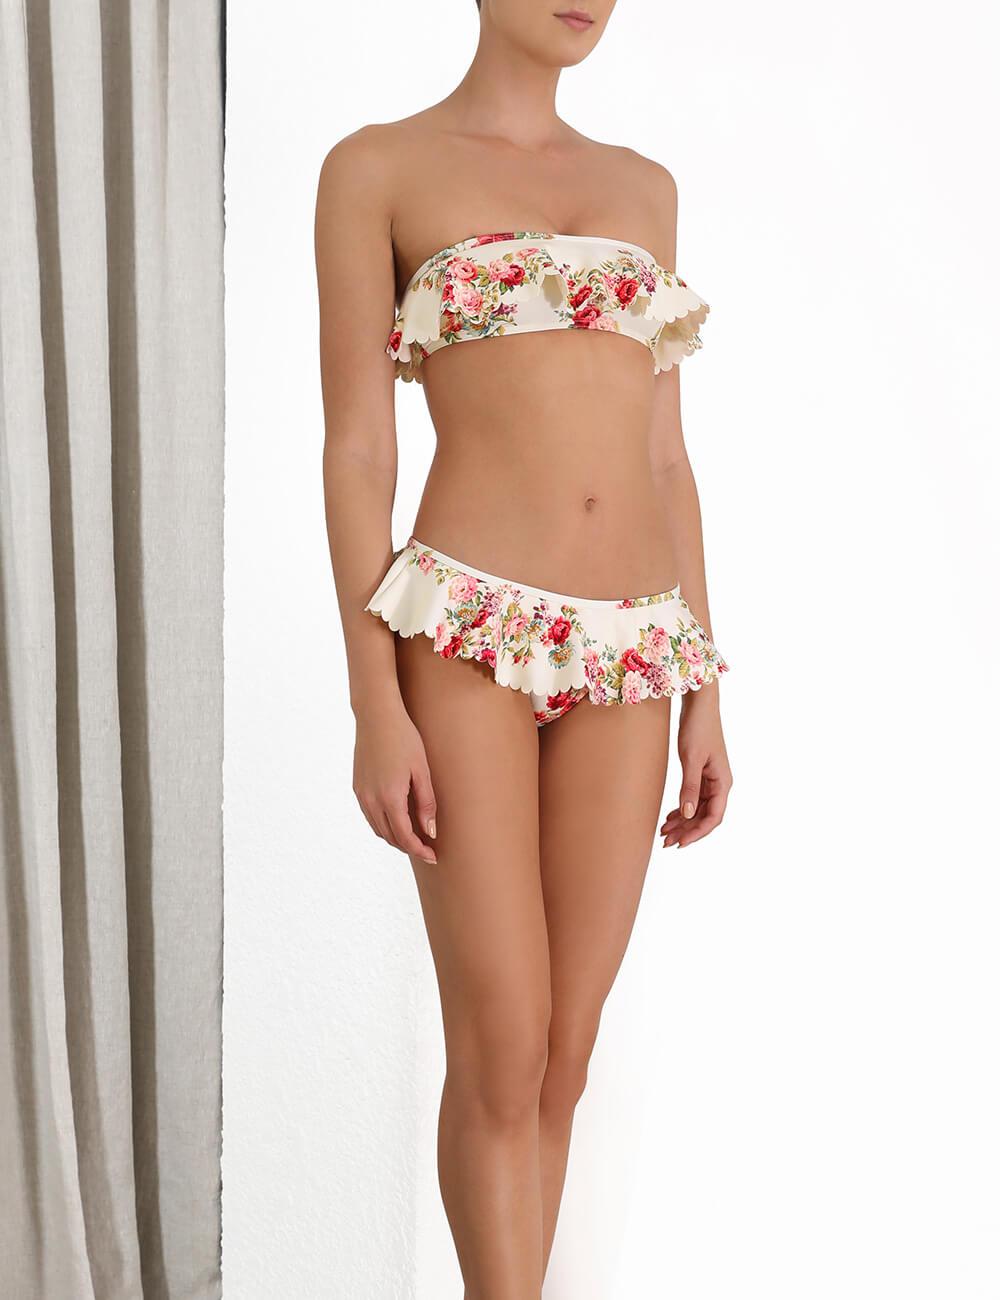 Honour Scallop Bikini Top